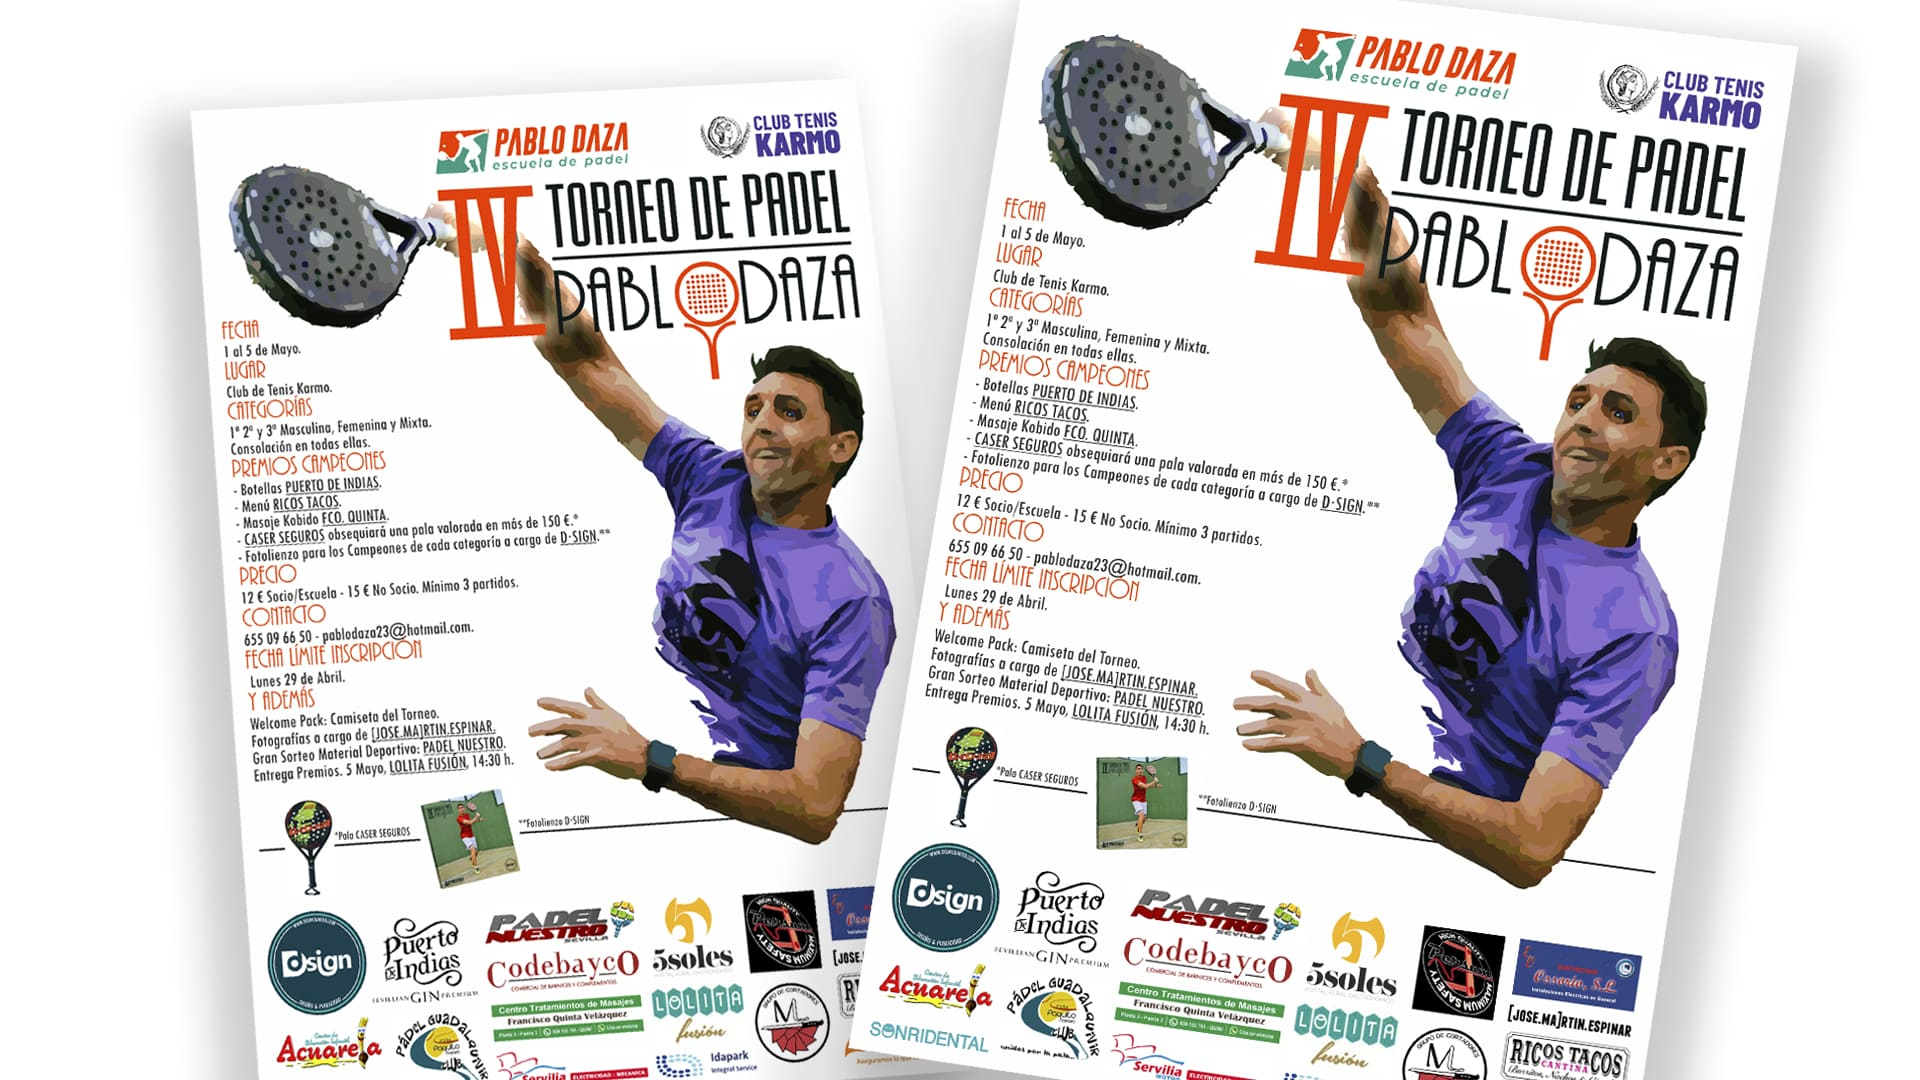 PABLO DAZA - Cartel IV Torneo Pablo Daza